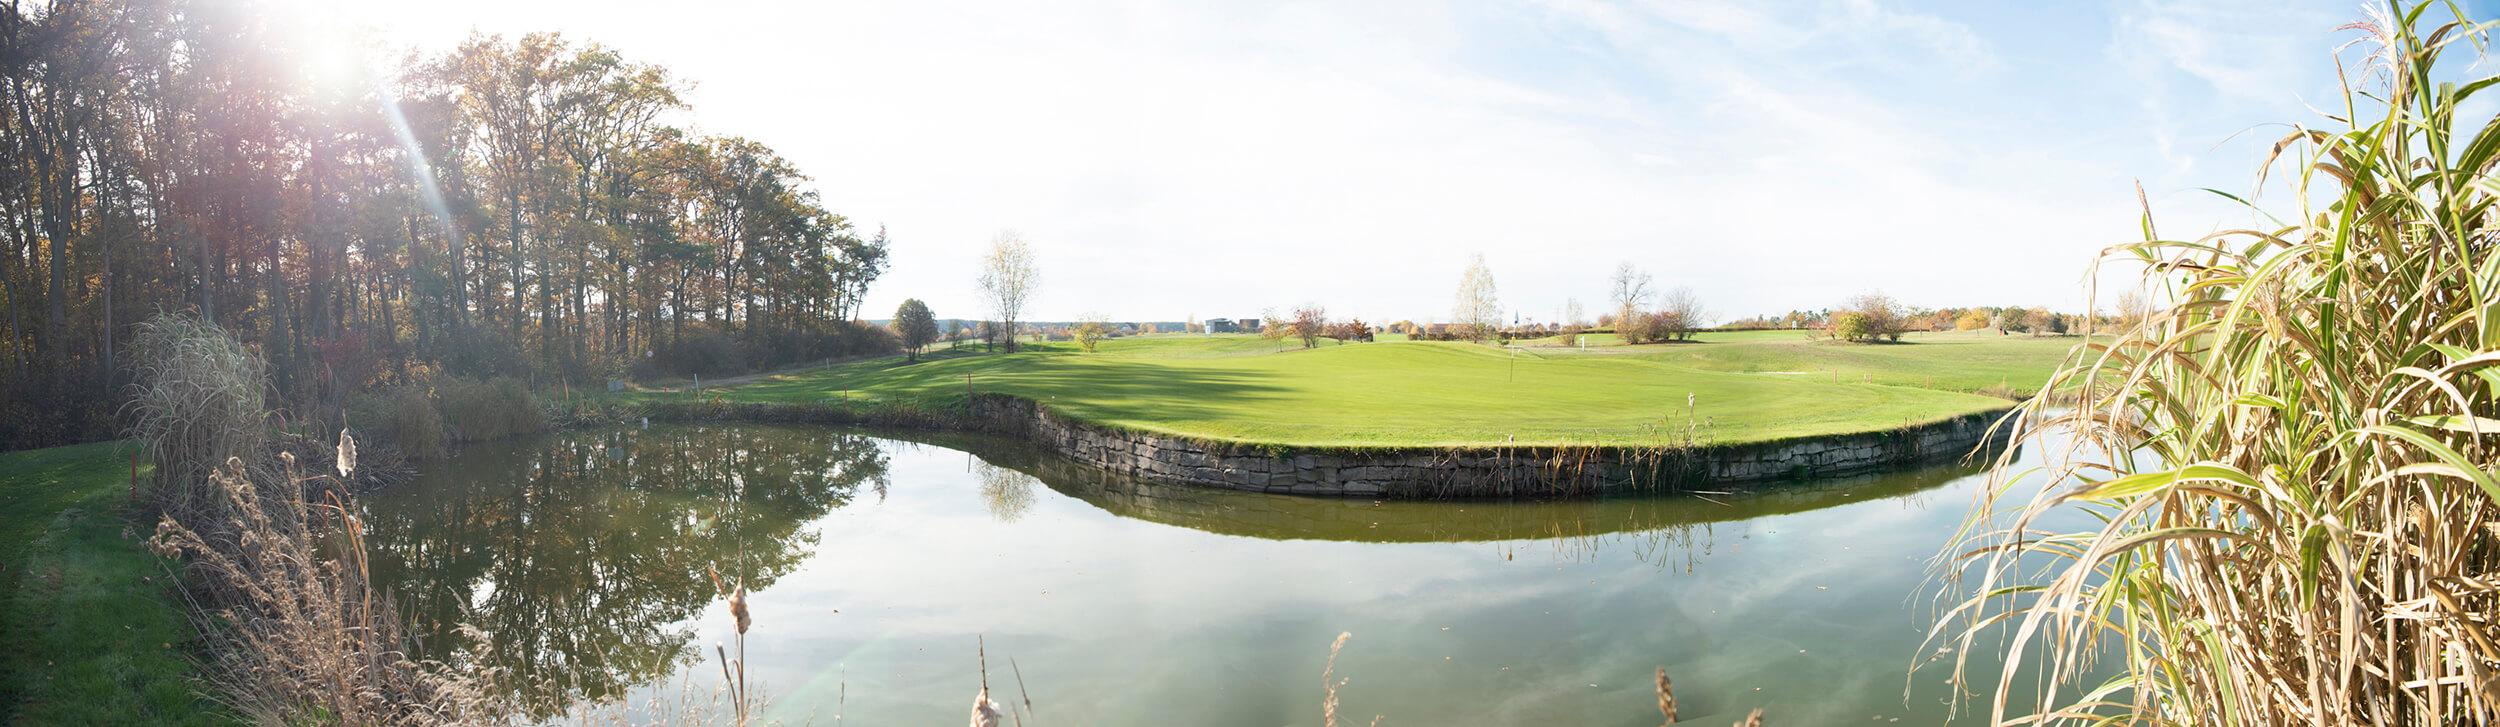 Golf-Club Herzogenaurach | Praesident